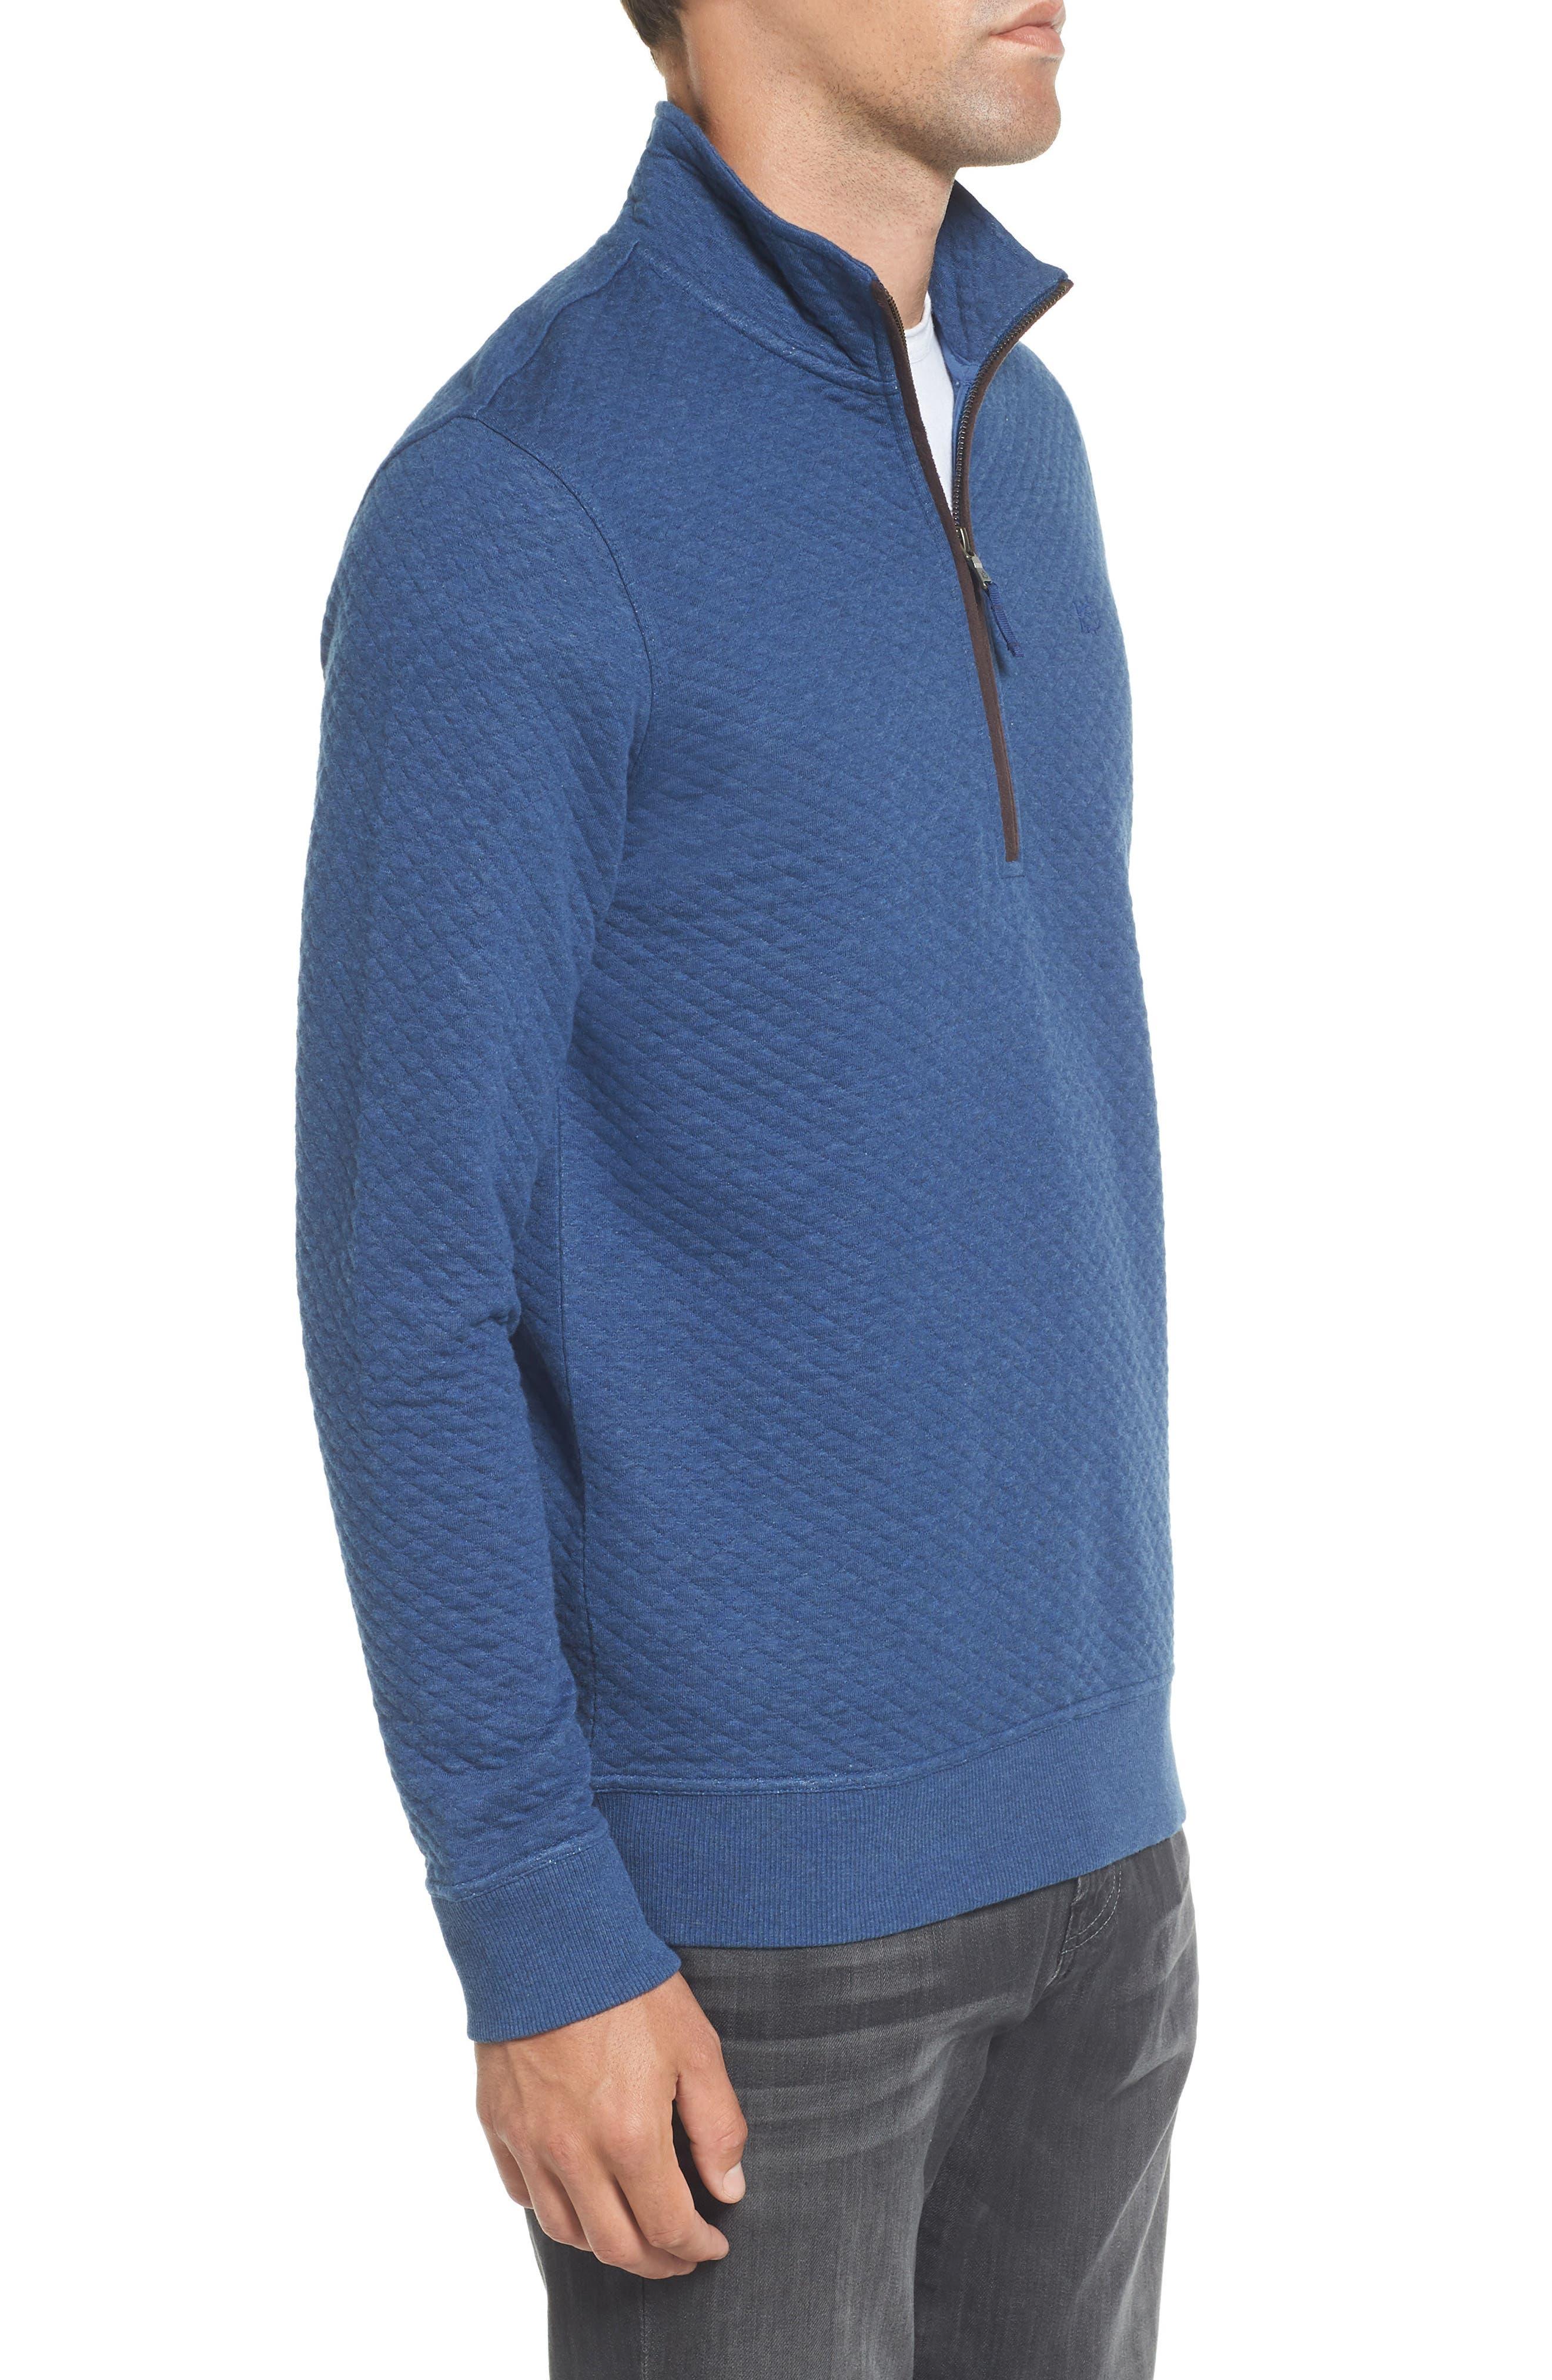 Sundown Quilted Quarter Zip Pullover,                             Alternate thumbnail 3, color,                             Skipper Blue